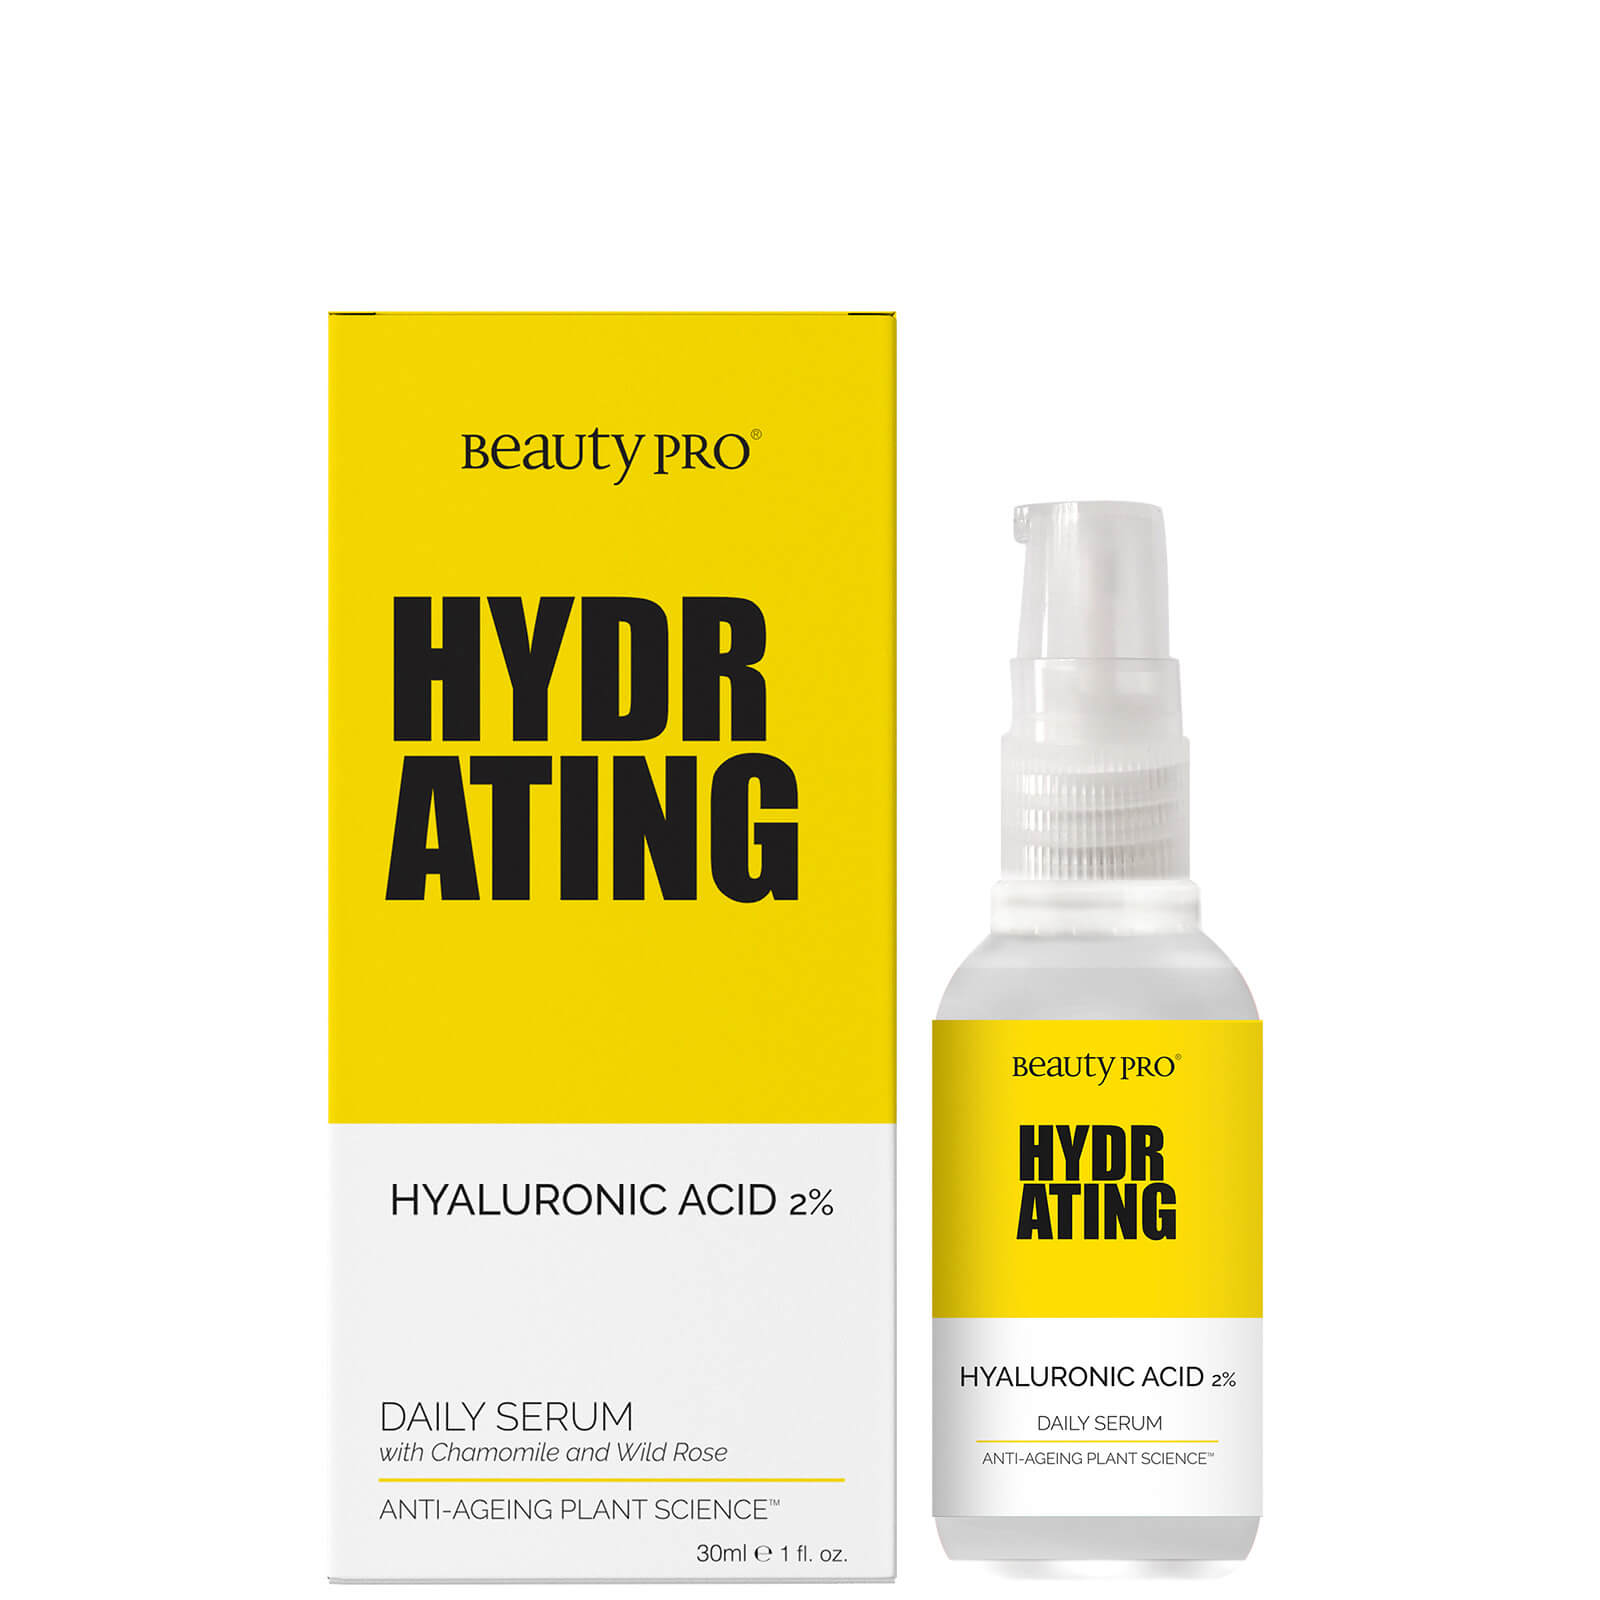 Купить BeautyPro Hydrating 1% Hyaluronic Acid Daily Serum 30ml